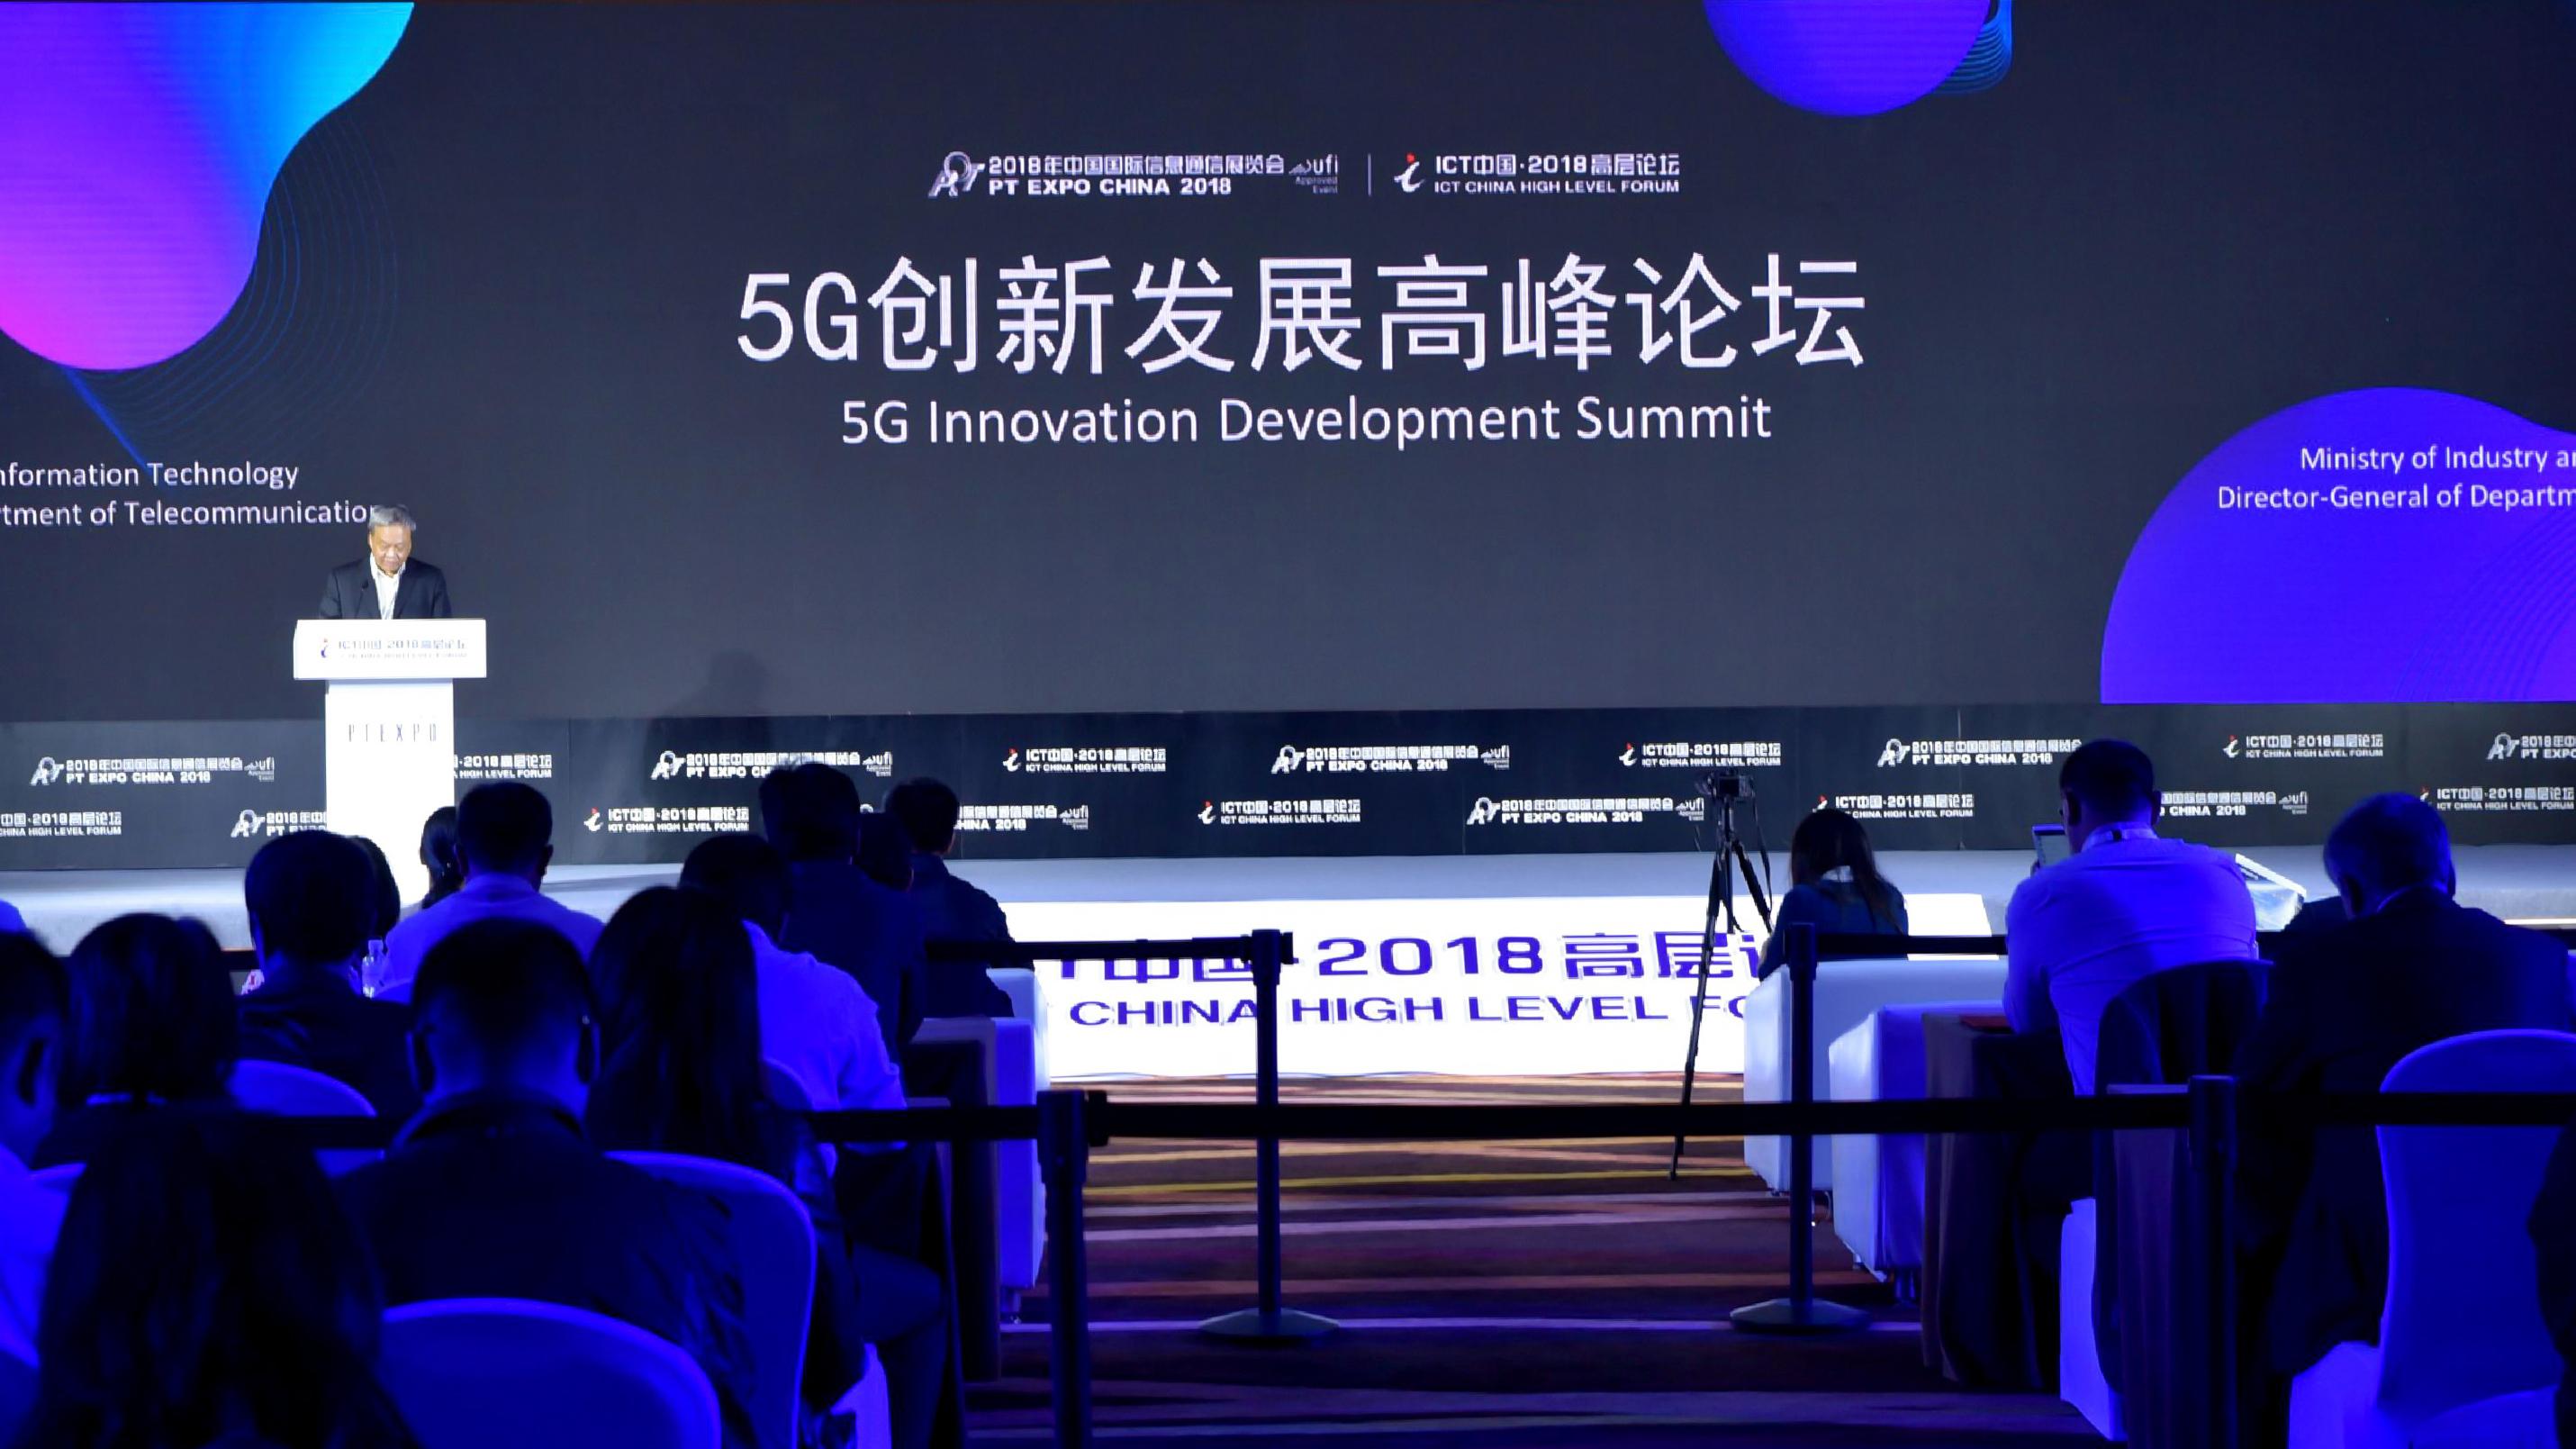 5G创新发展高峰论坛将举行 为商用时代揭幕